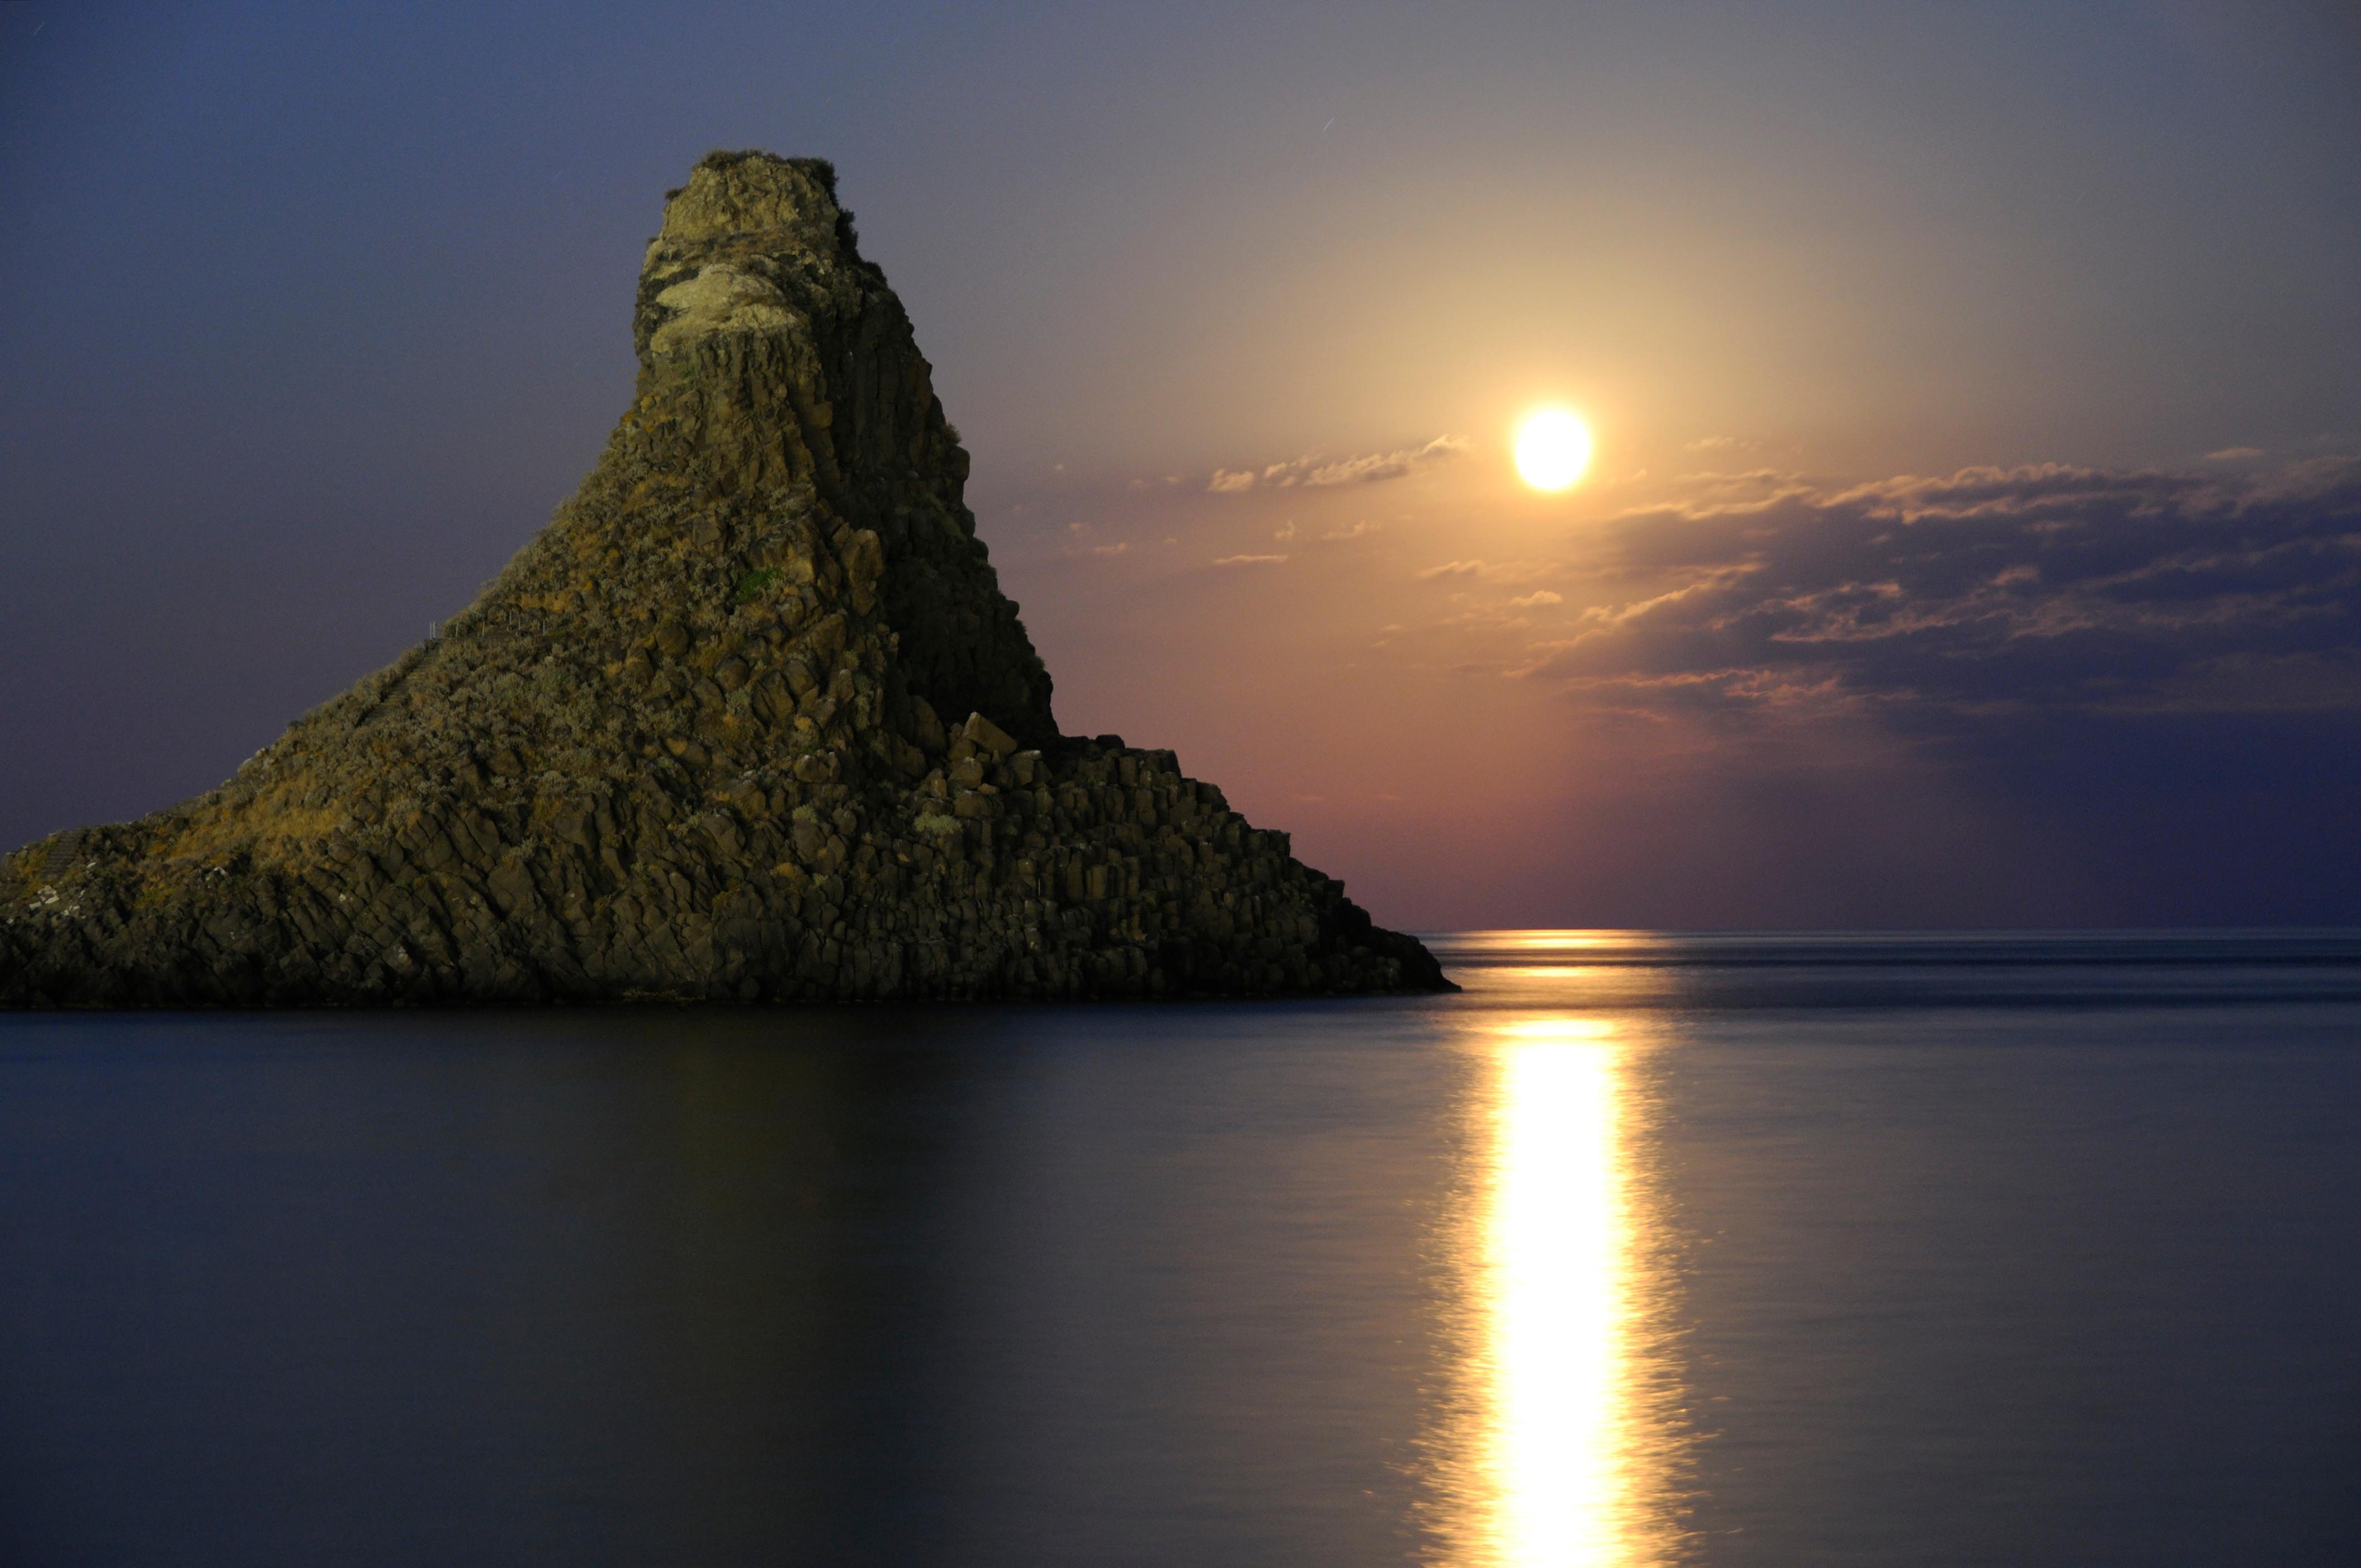 Wallpaper : travel, sunset, sea, Italy, Public, night